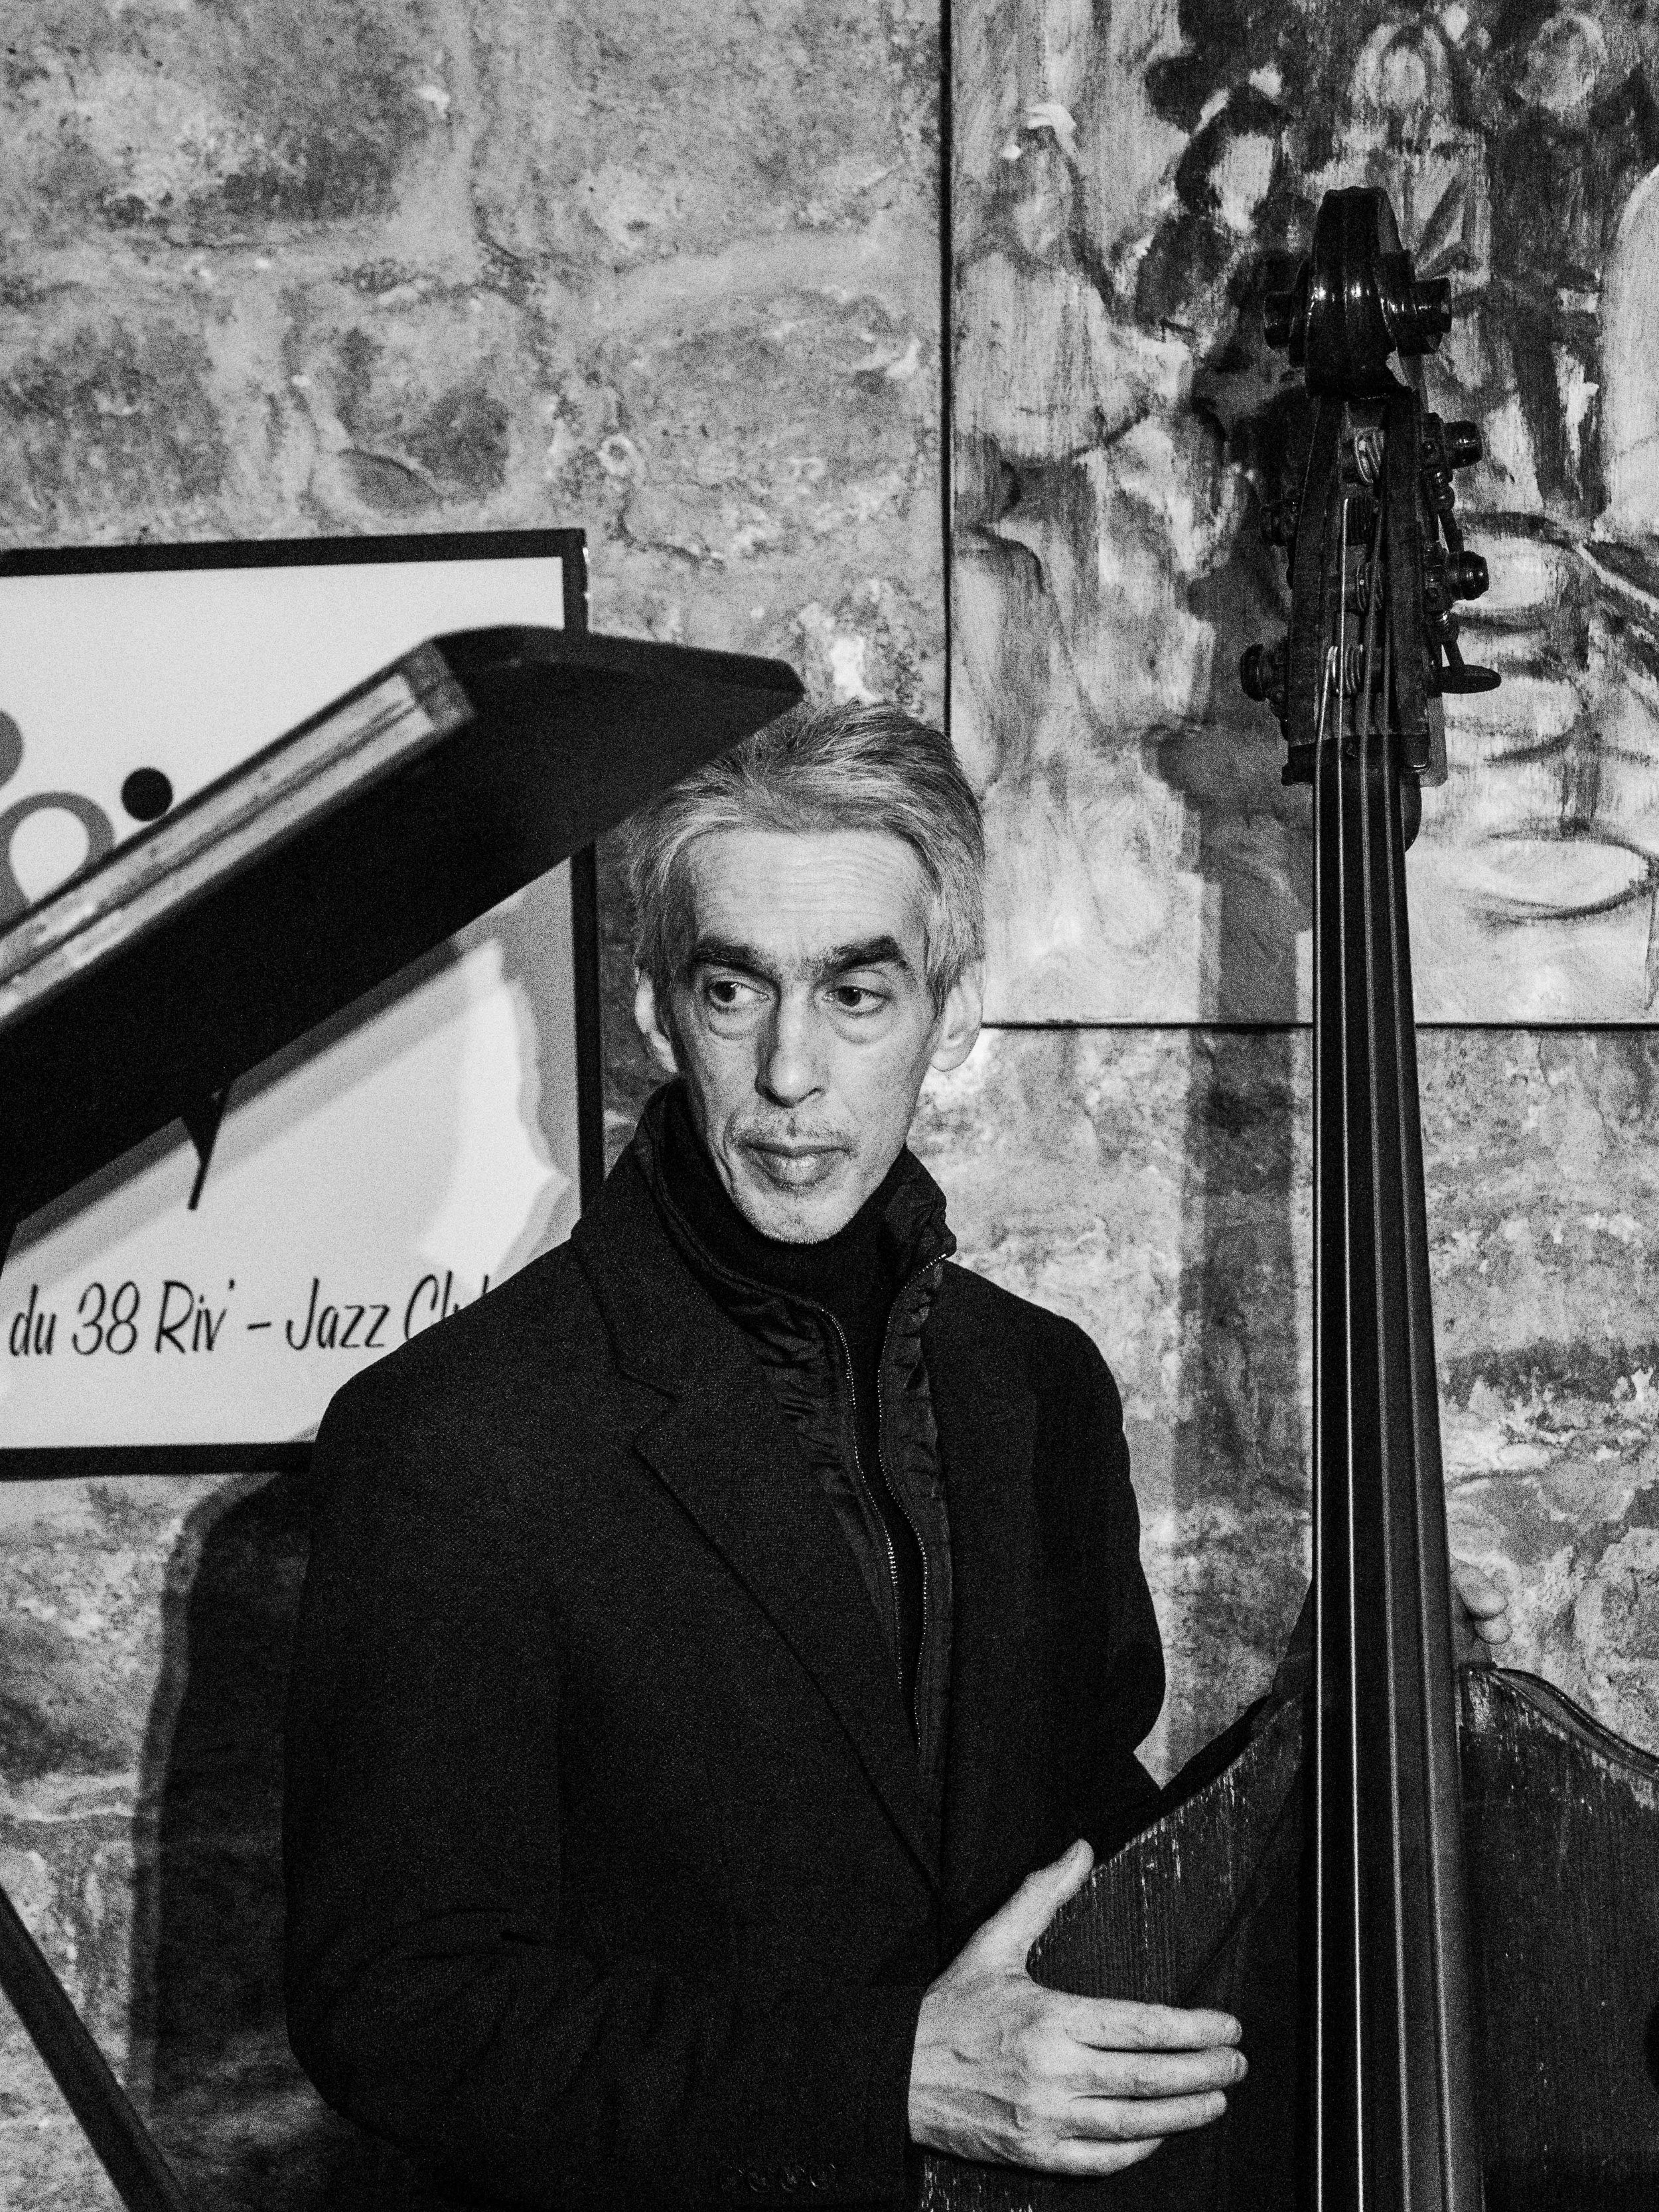 Bass Player at 38 Riv Jazz Club